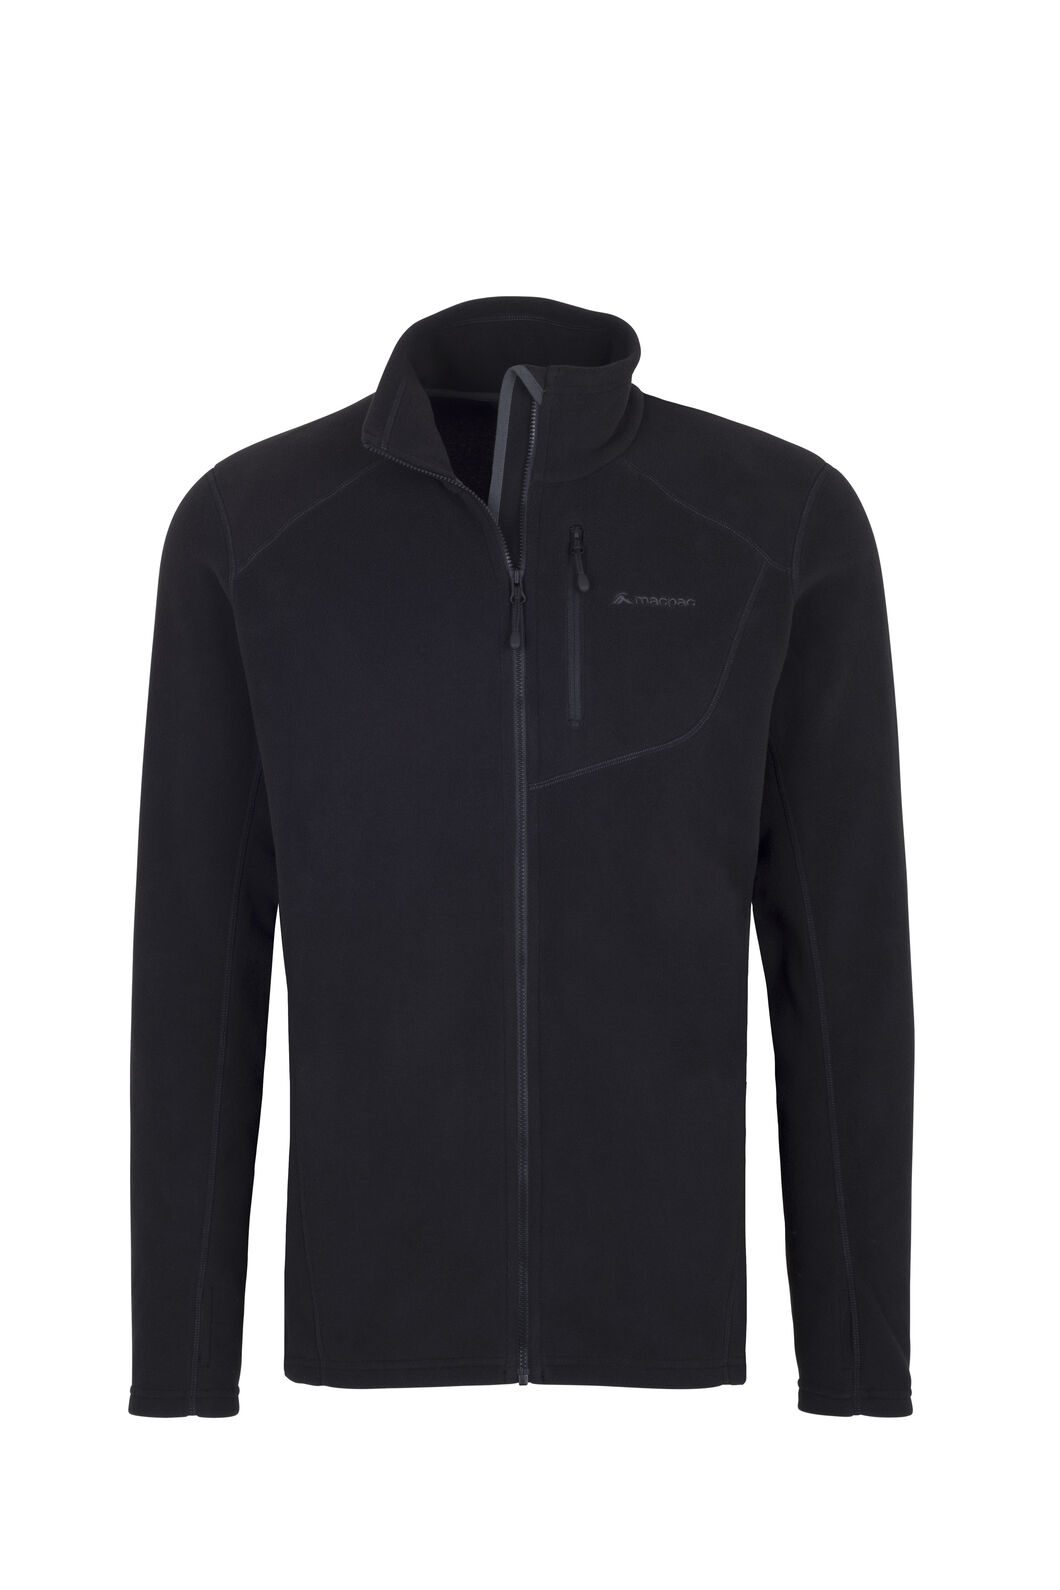 Macpac Kea Polartec® Micro Fleece® Jacket - Men's, Black, hi-res